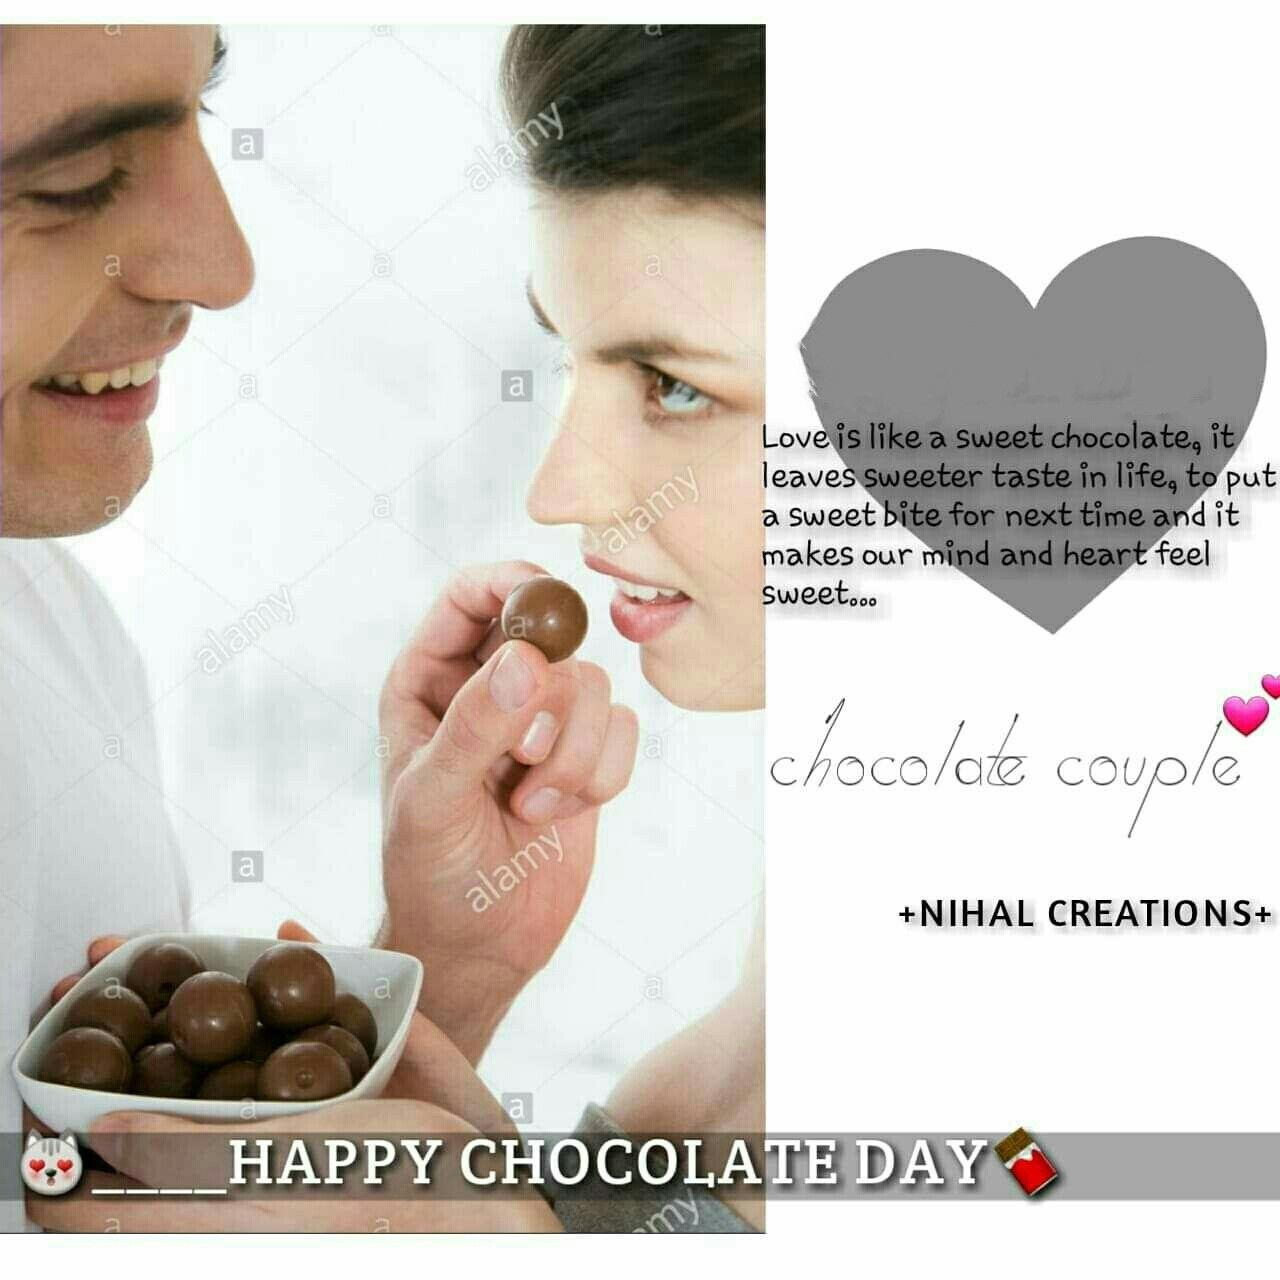 Chocolate Day Stauts Shayari In Hindi Language Chocolate Day Happy Chocolate Day Chocolate Day Shayari